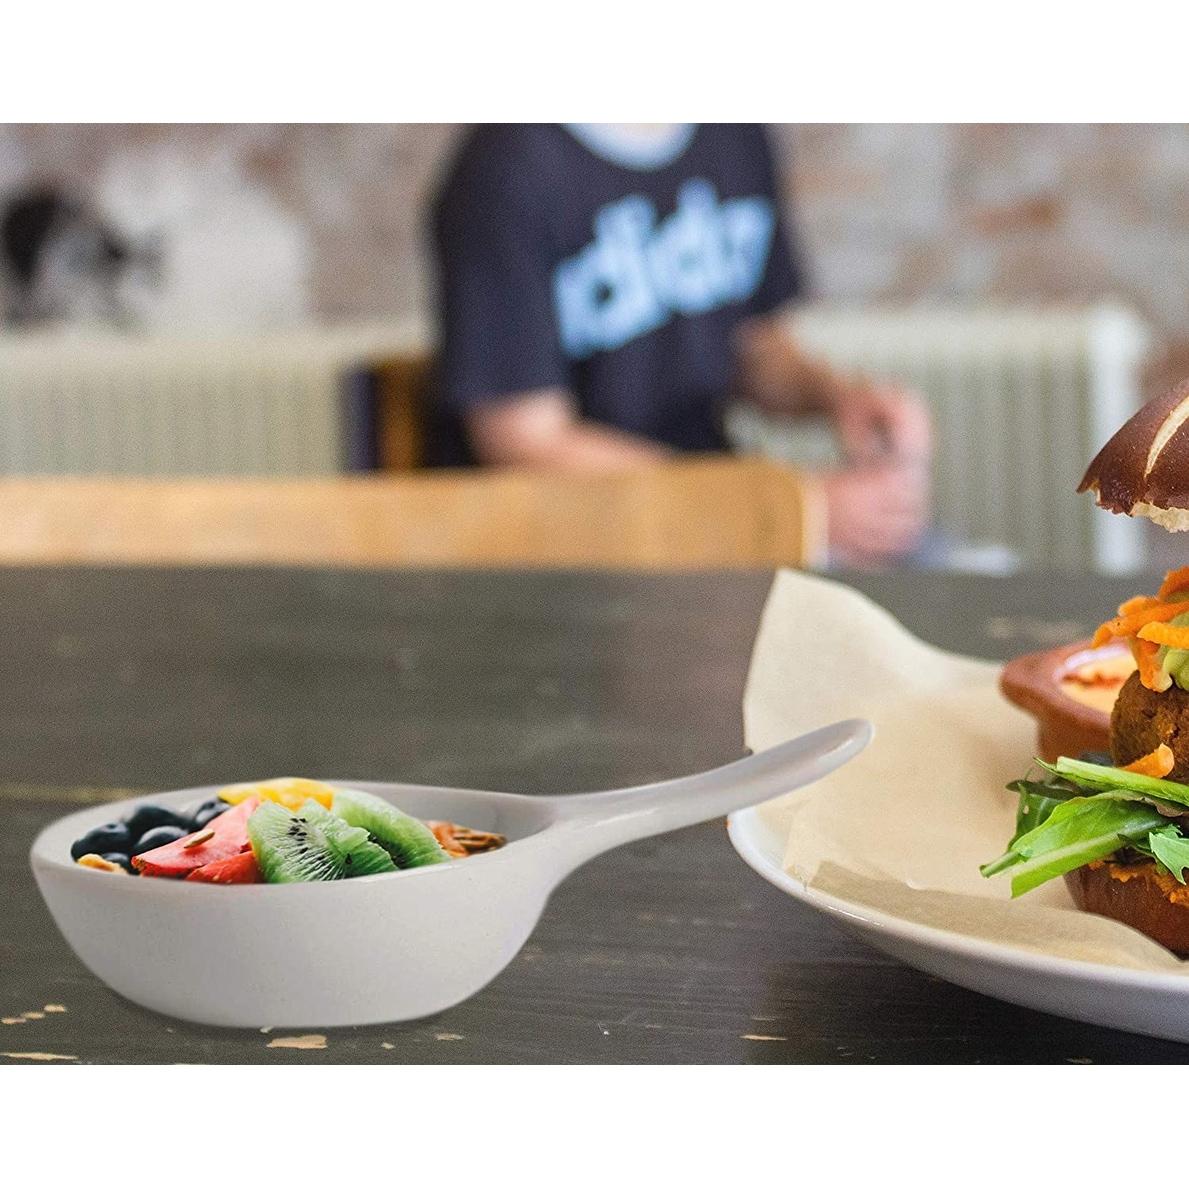 4X Sauce Dishes Melamine Round Appetizer Plates Seasoning Dish Food Dipping Bowl